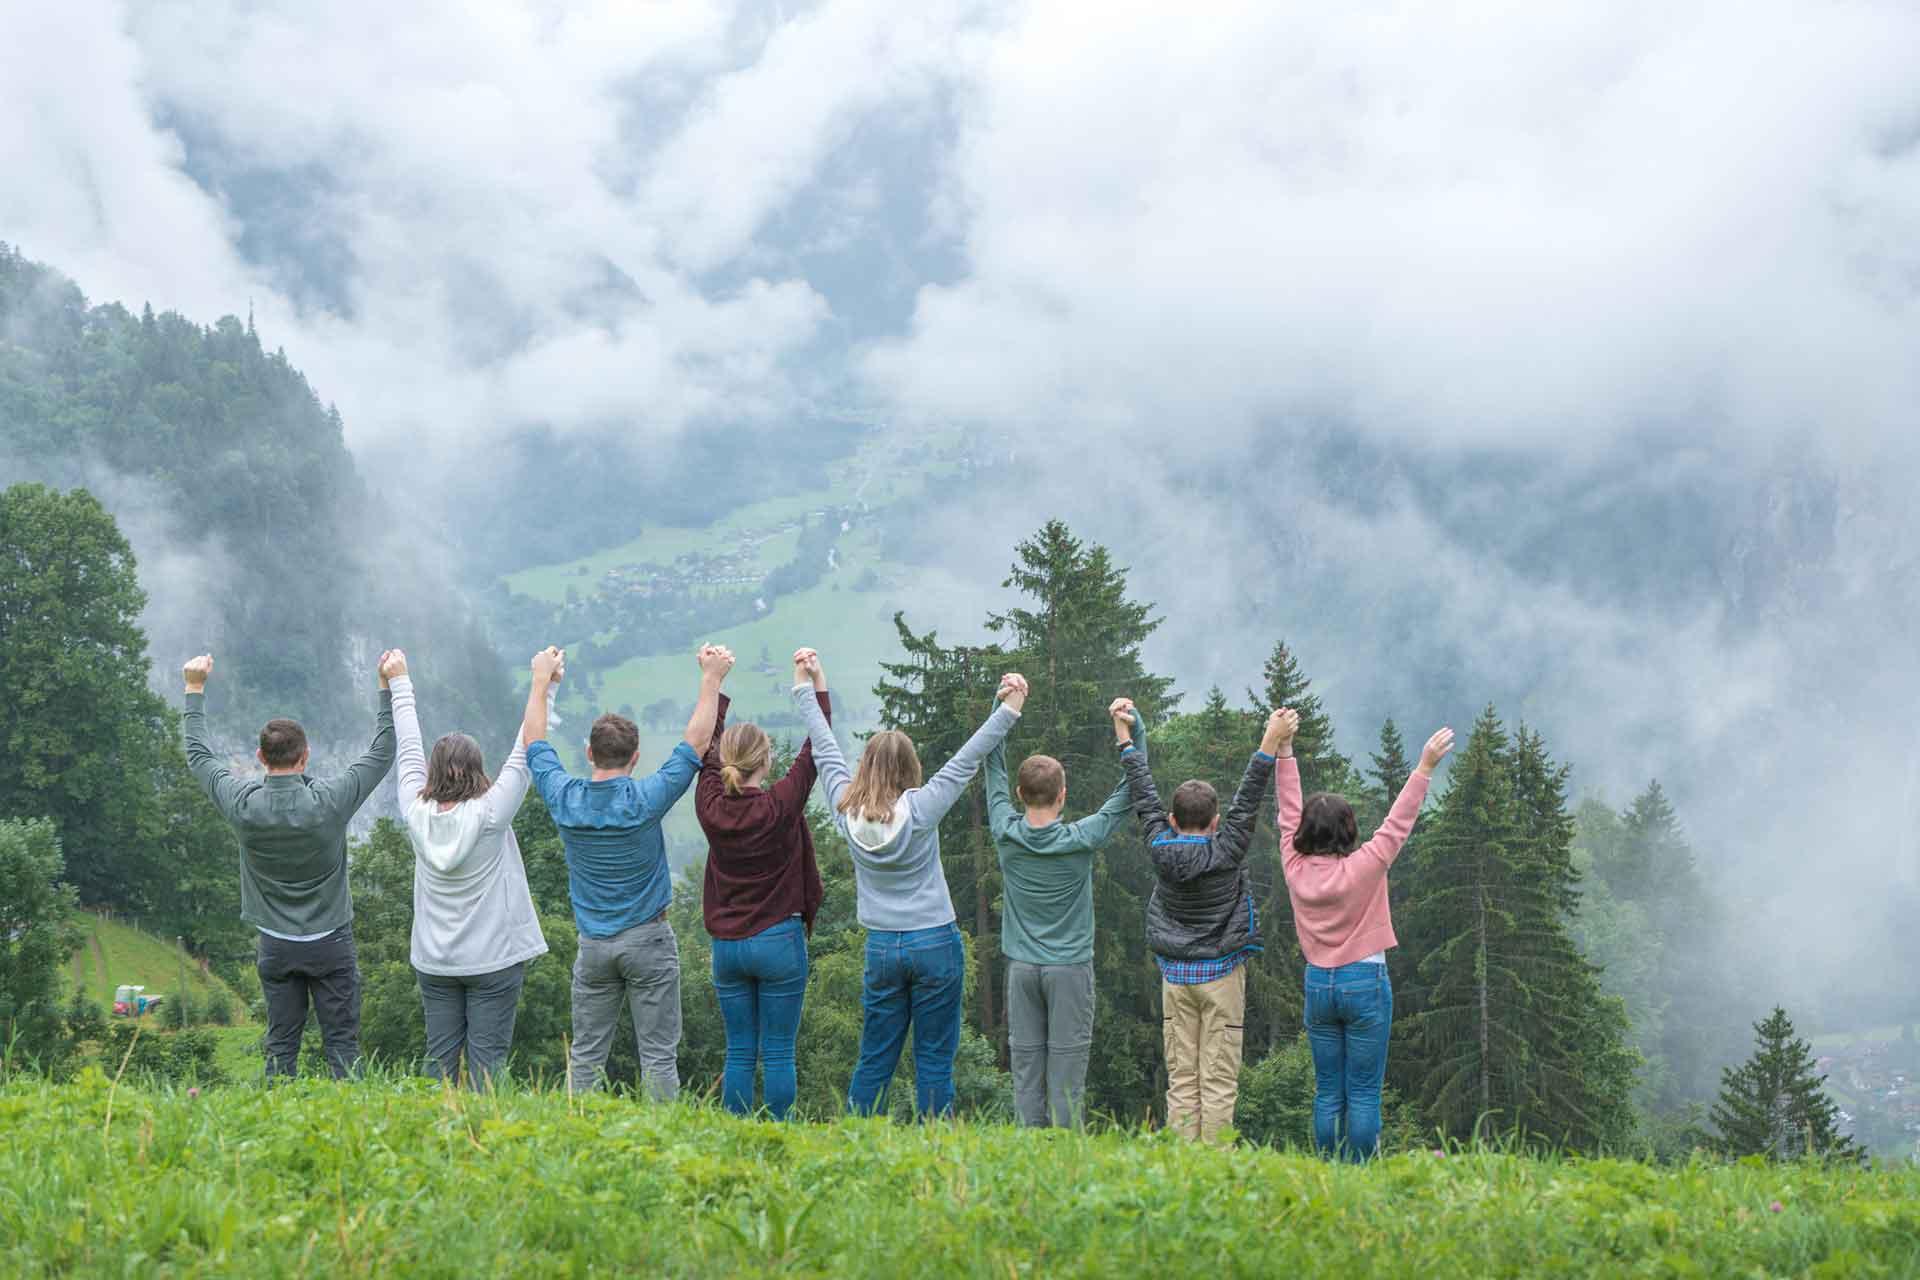 Family photo shoot in Wengen Switzerland